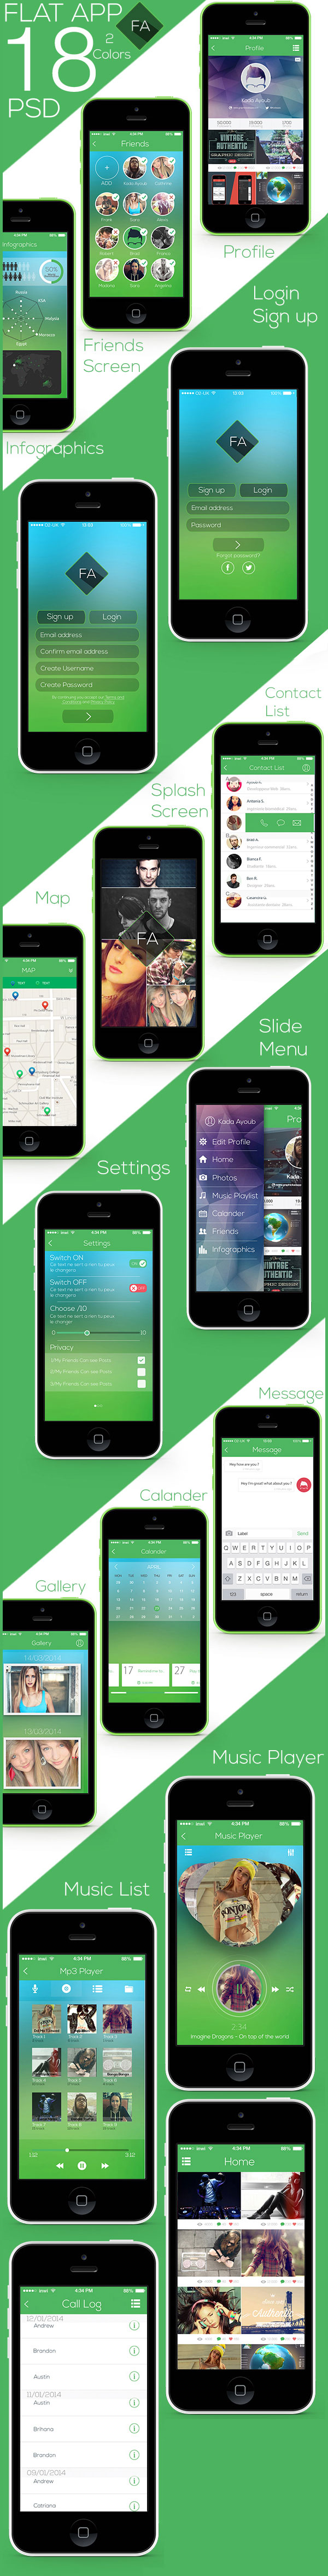 50+ Best Free Mobile App UI Kits PSD | Designmaz